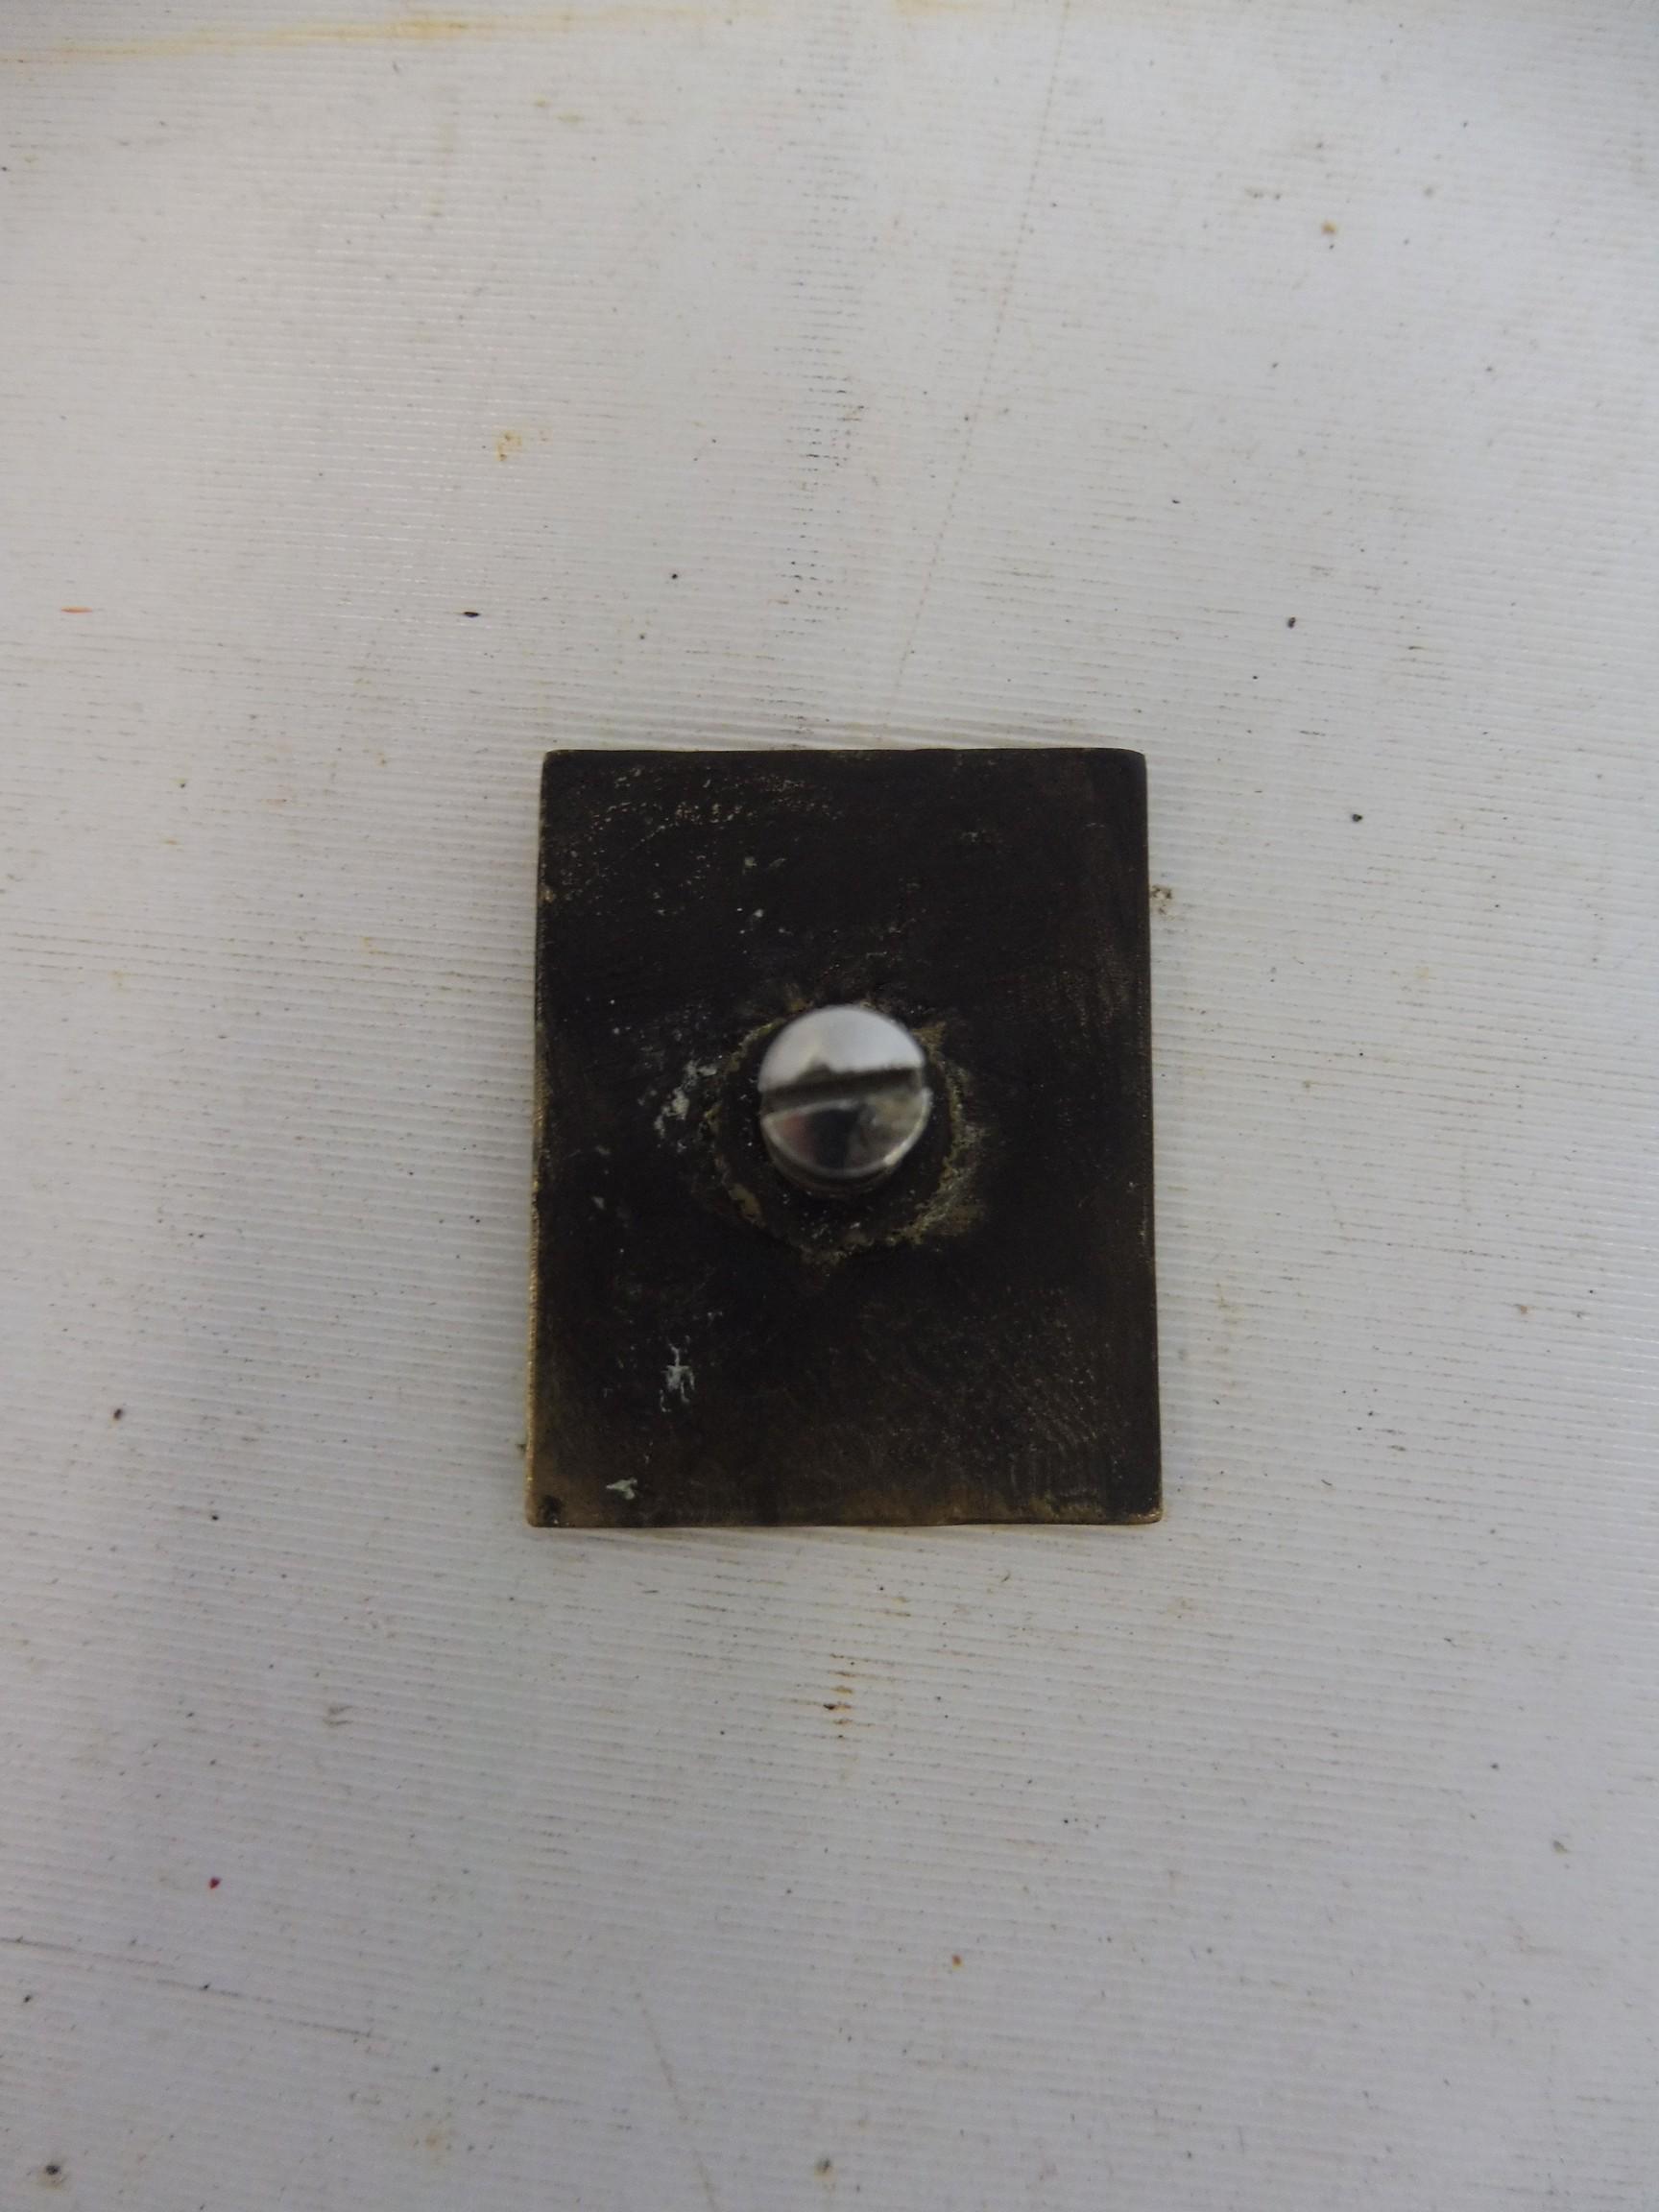 A JB Jack Barclays RR Rolls-Royce brass badge. - Image 2 of 2